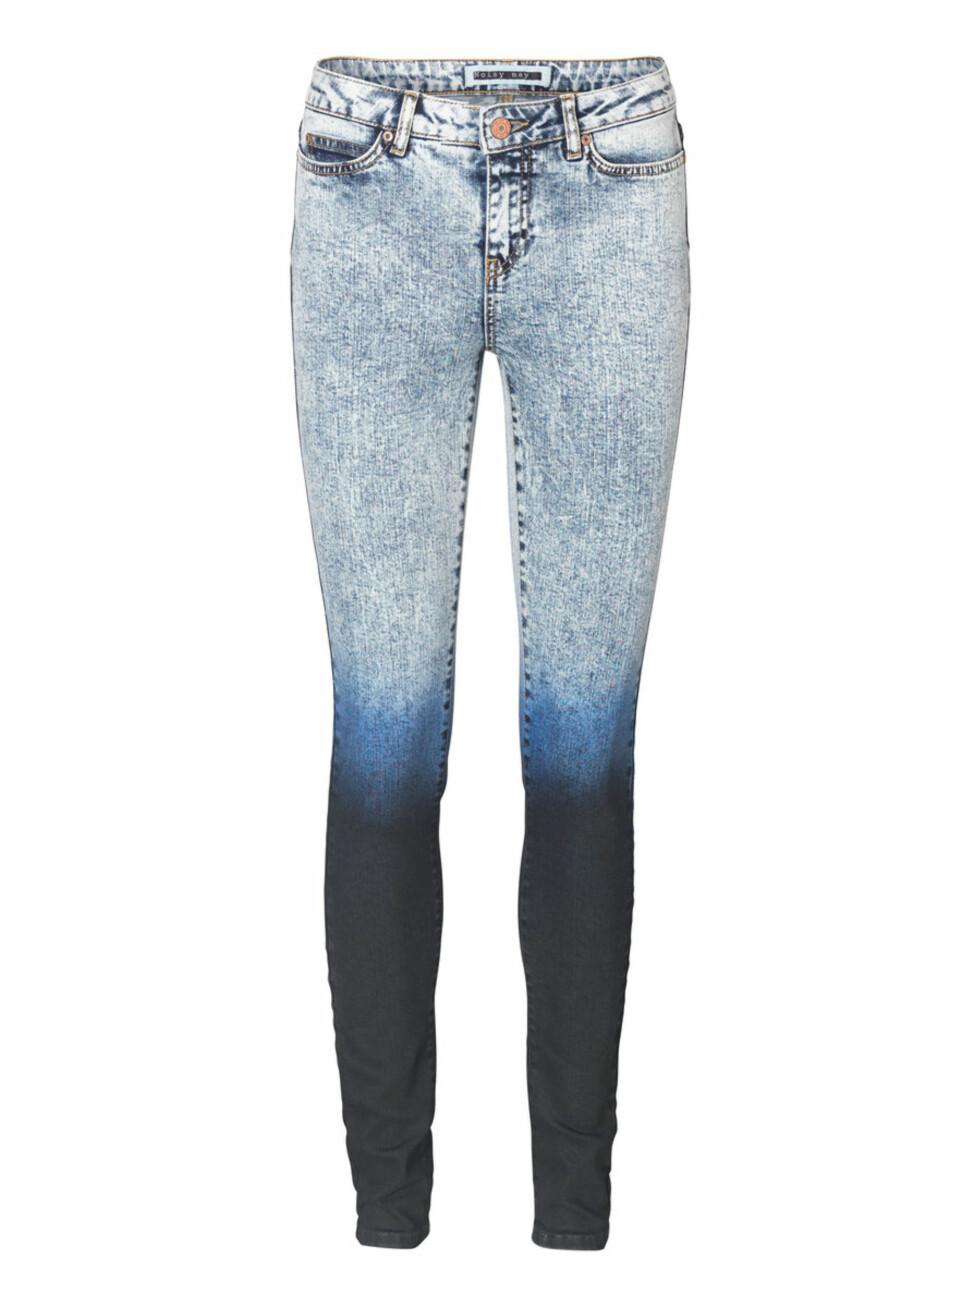 Jeans med dip dye-effekt (kr 400, Noisy may). Foto: Produsenten